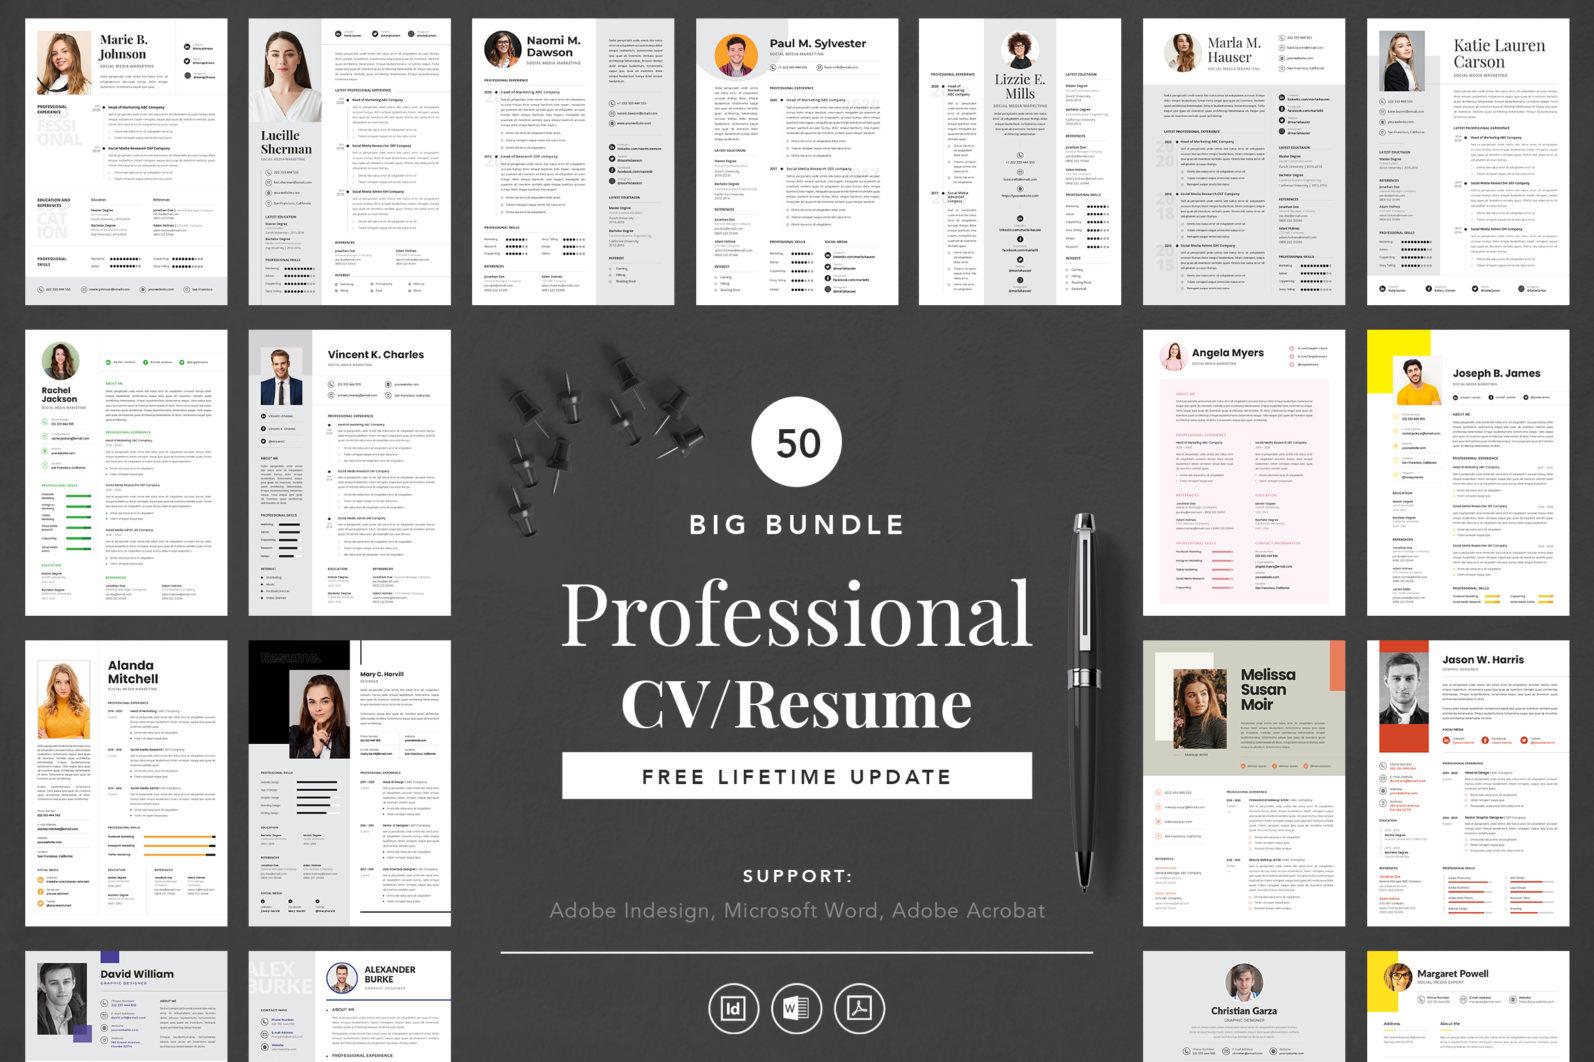 Big Bundle Professional CV Resume Indesign Template - COVER IMAGE 1 -